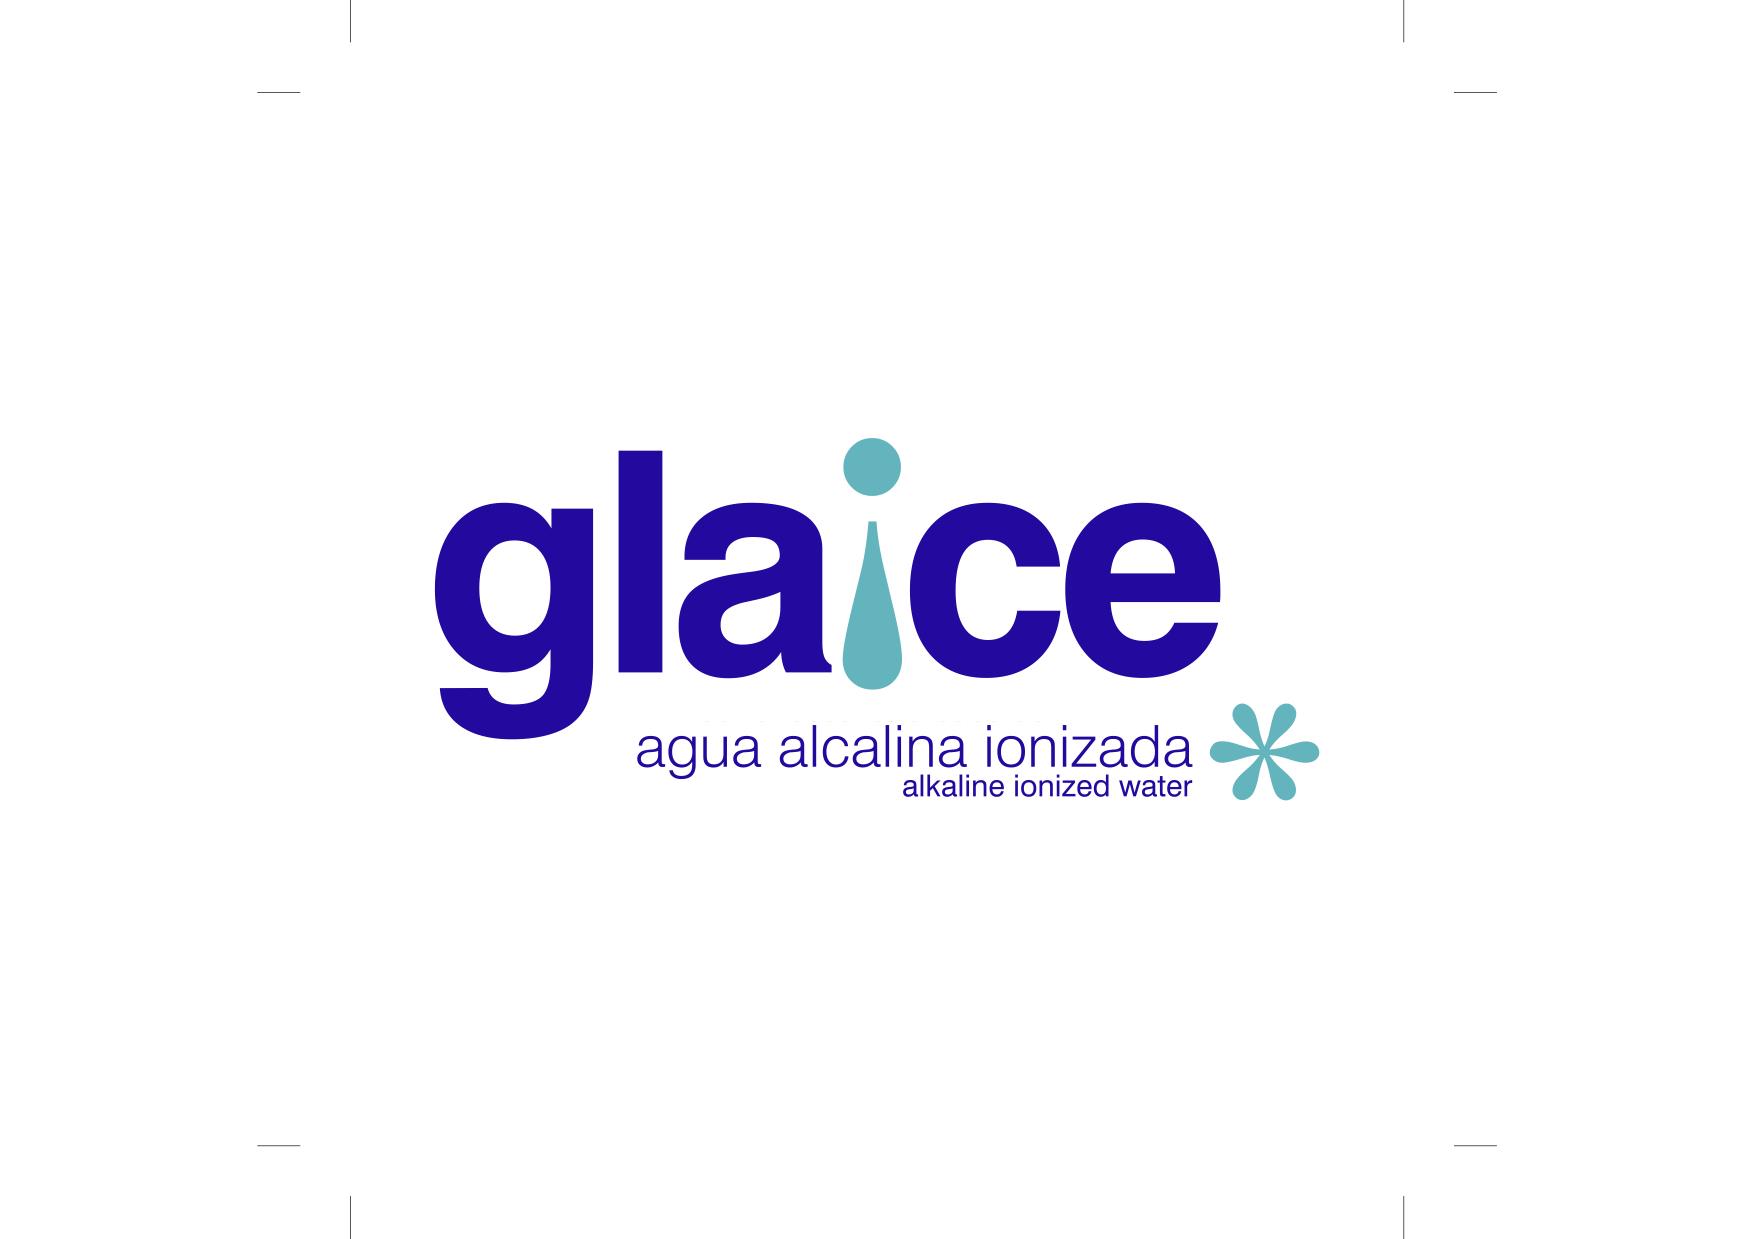 GLAICE-LOGO-BOTELLAS_sin bebrefs